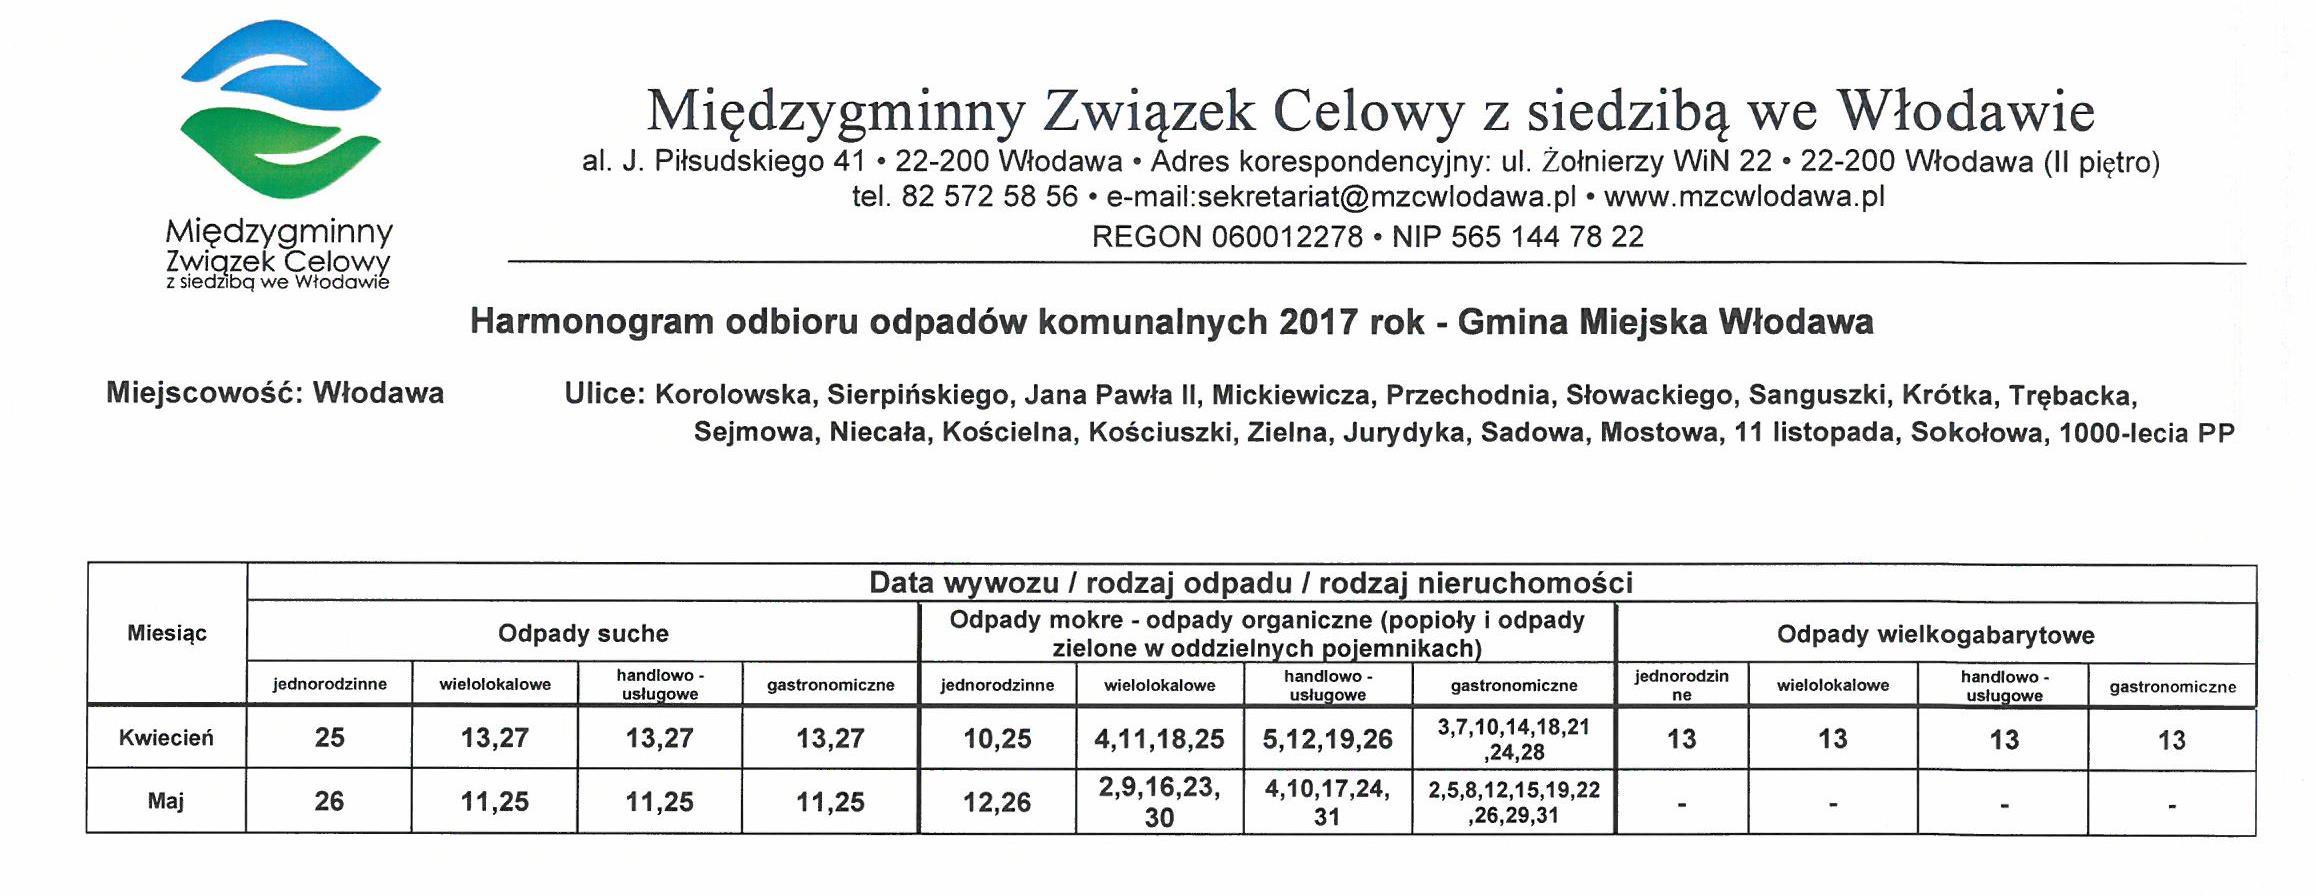 Włodawa (Korolowska)